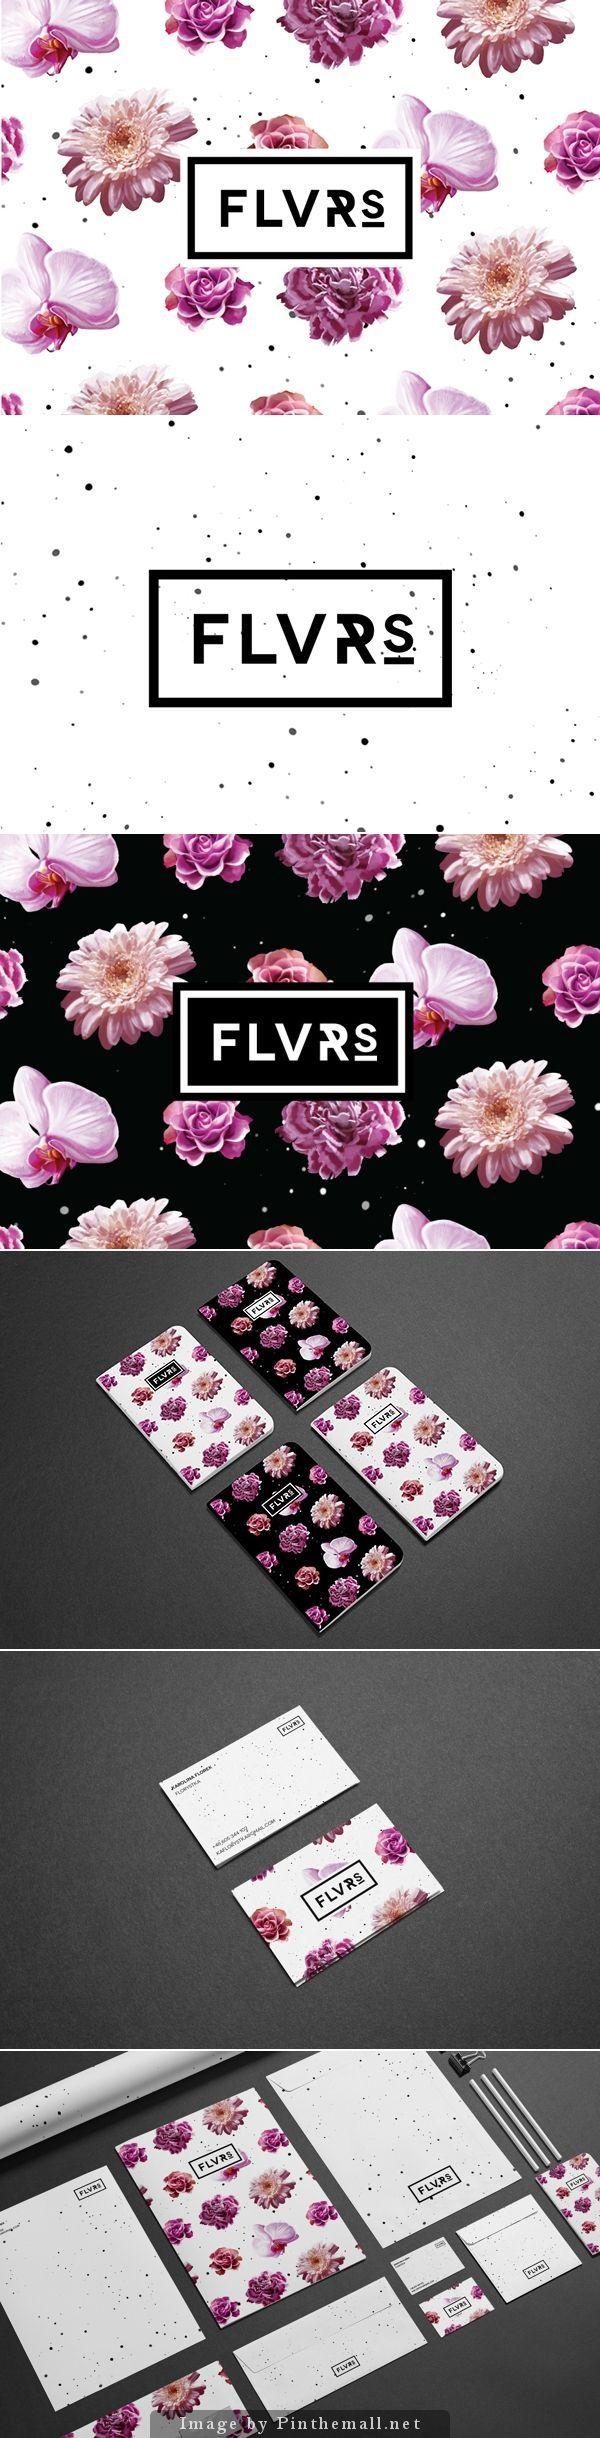 (2) Flvrs Brand Identity | Gráfico! | Pinterest